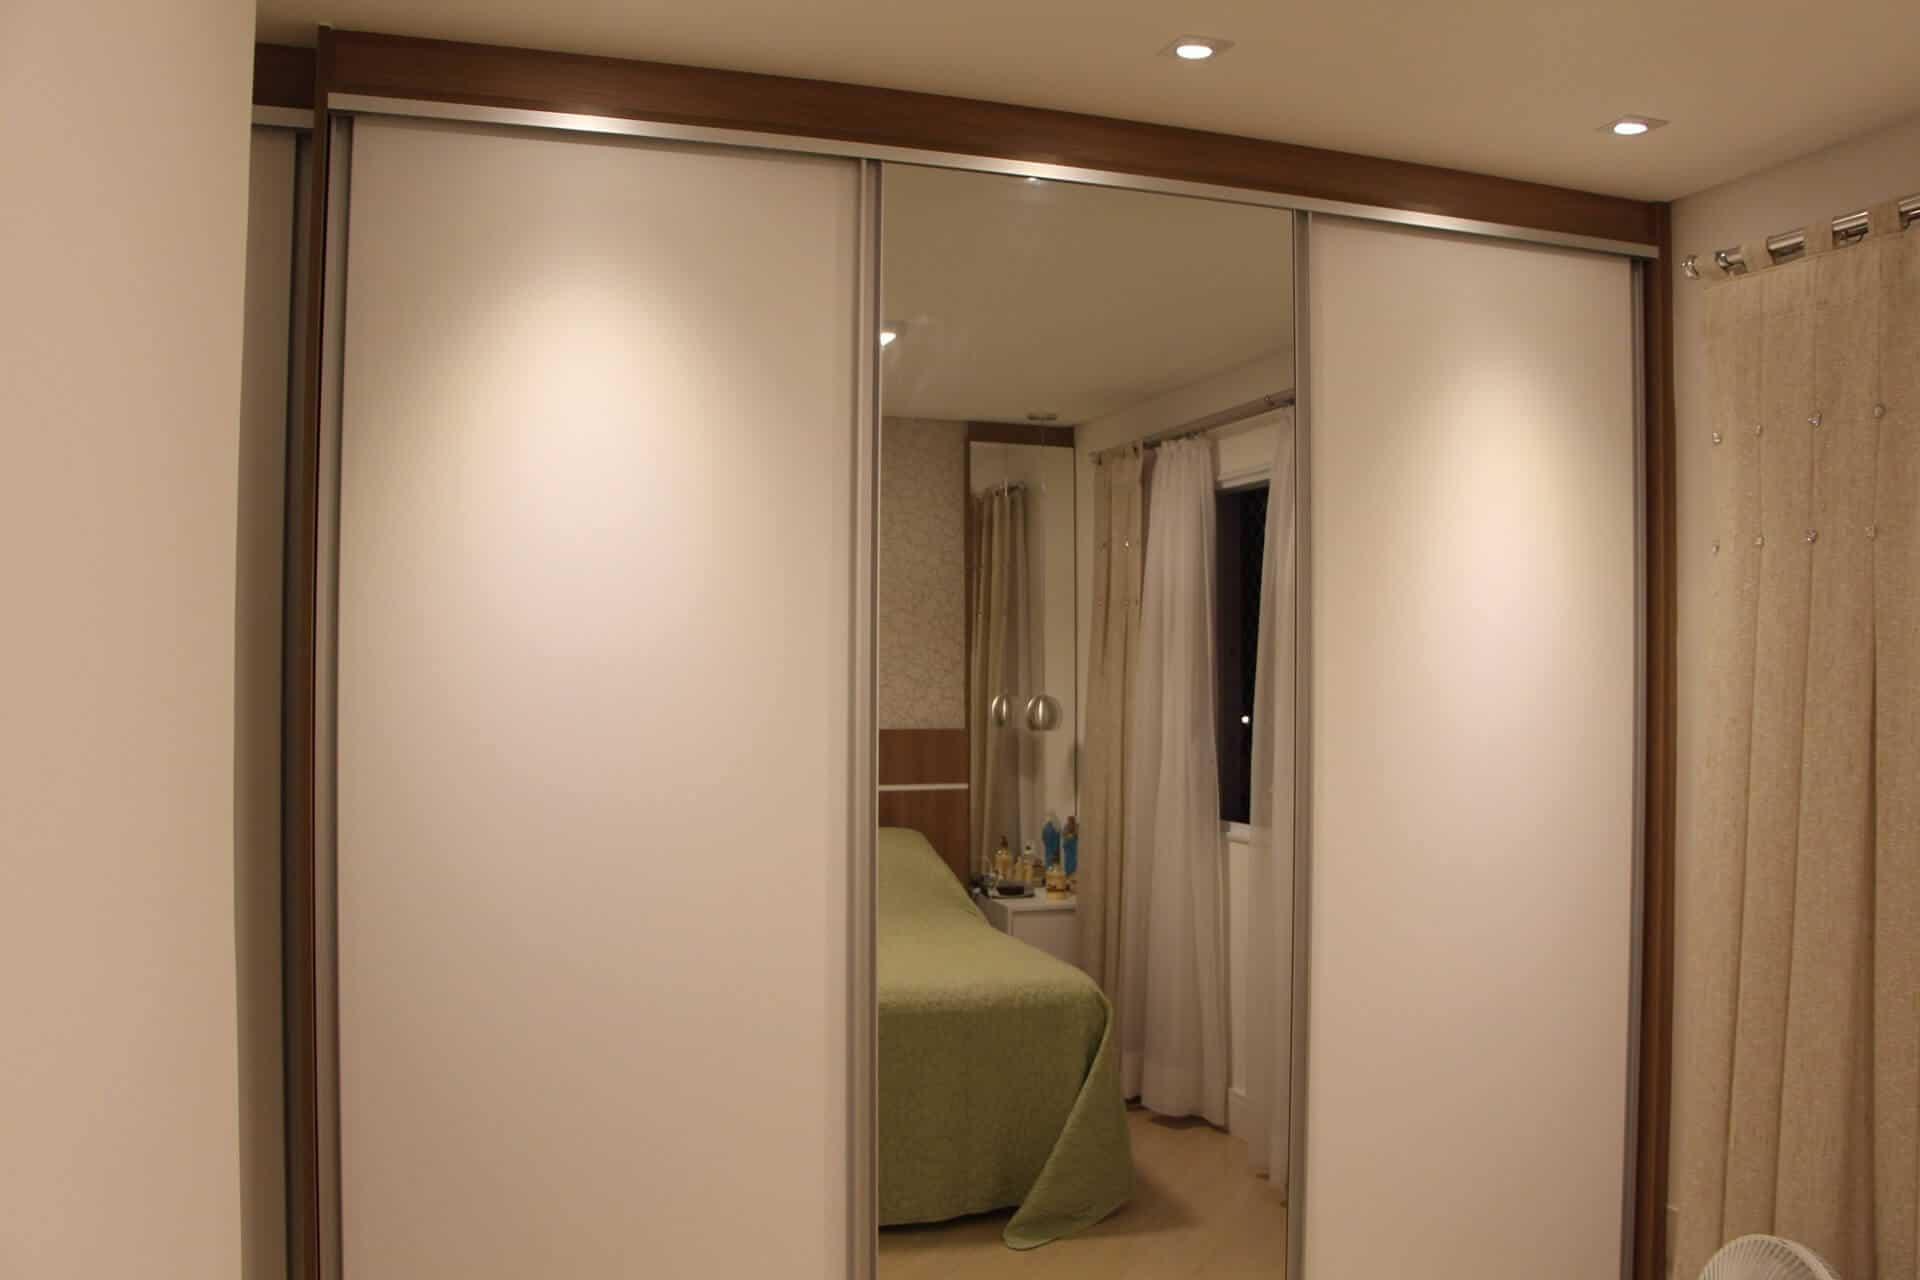 dormitorio-planejado_moveis-sob-medida-galeria-122